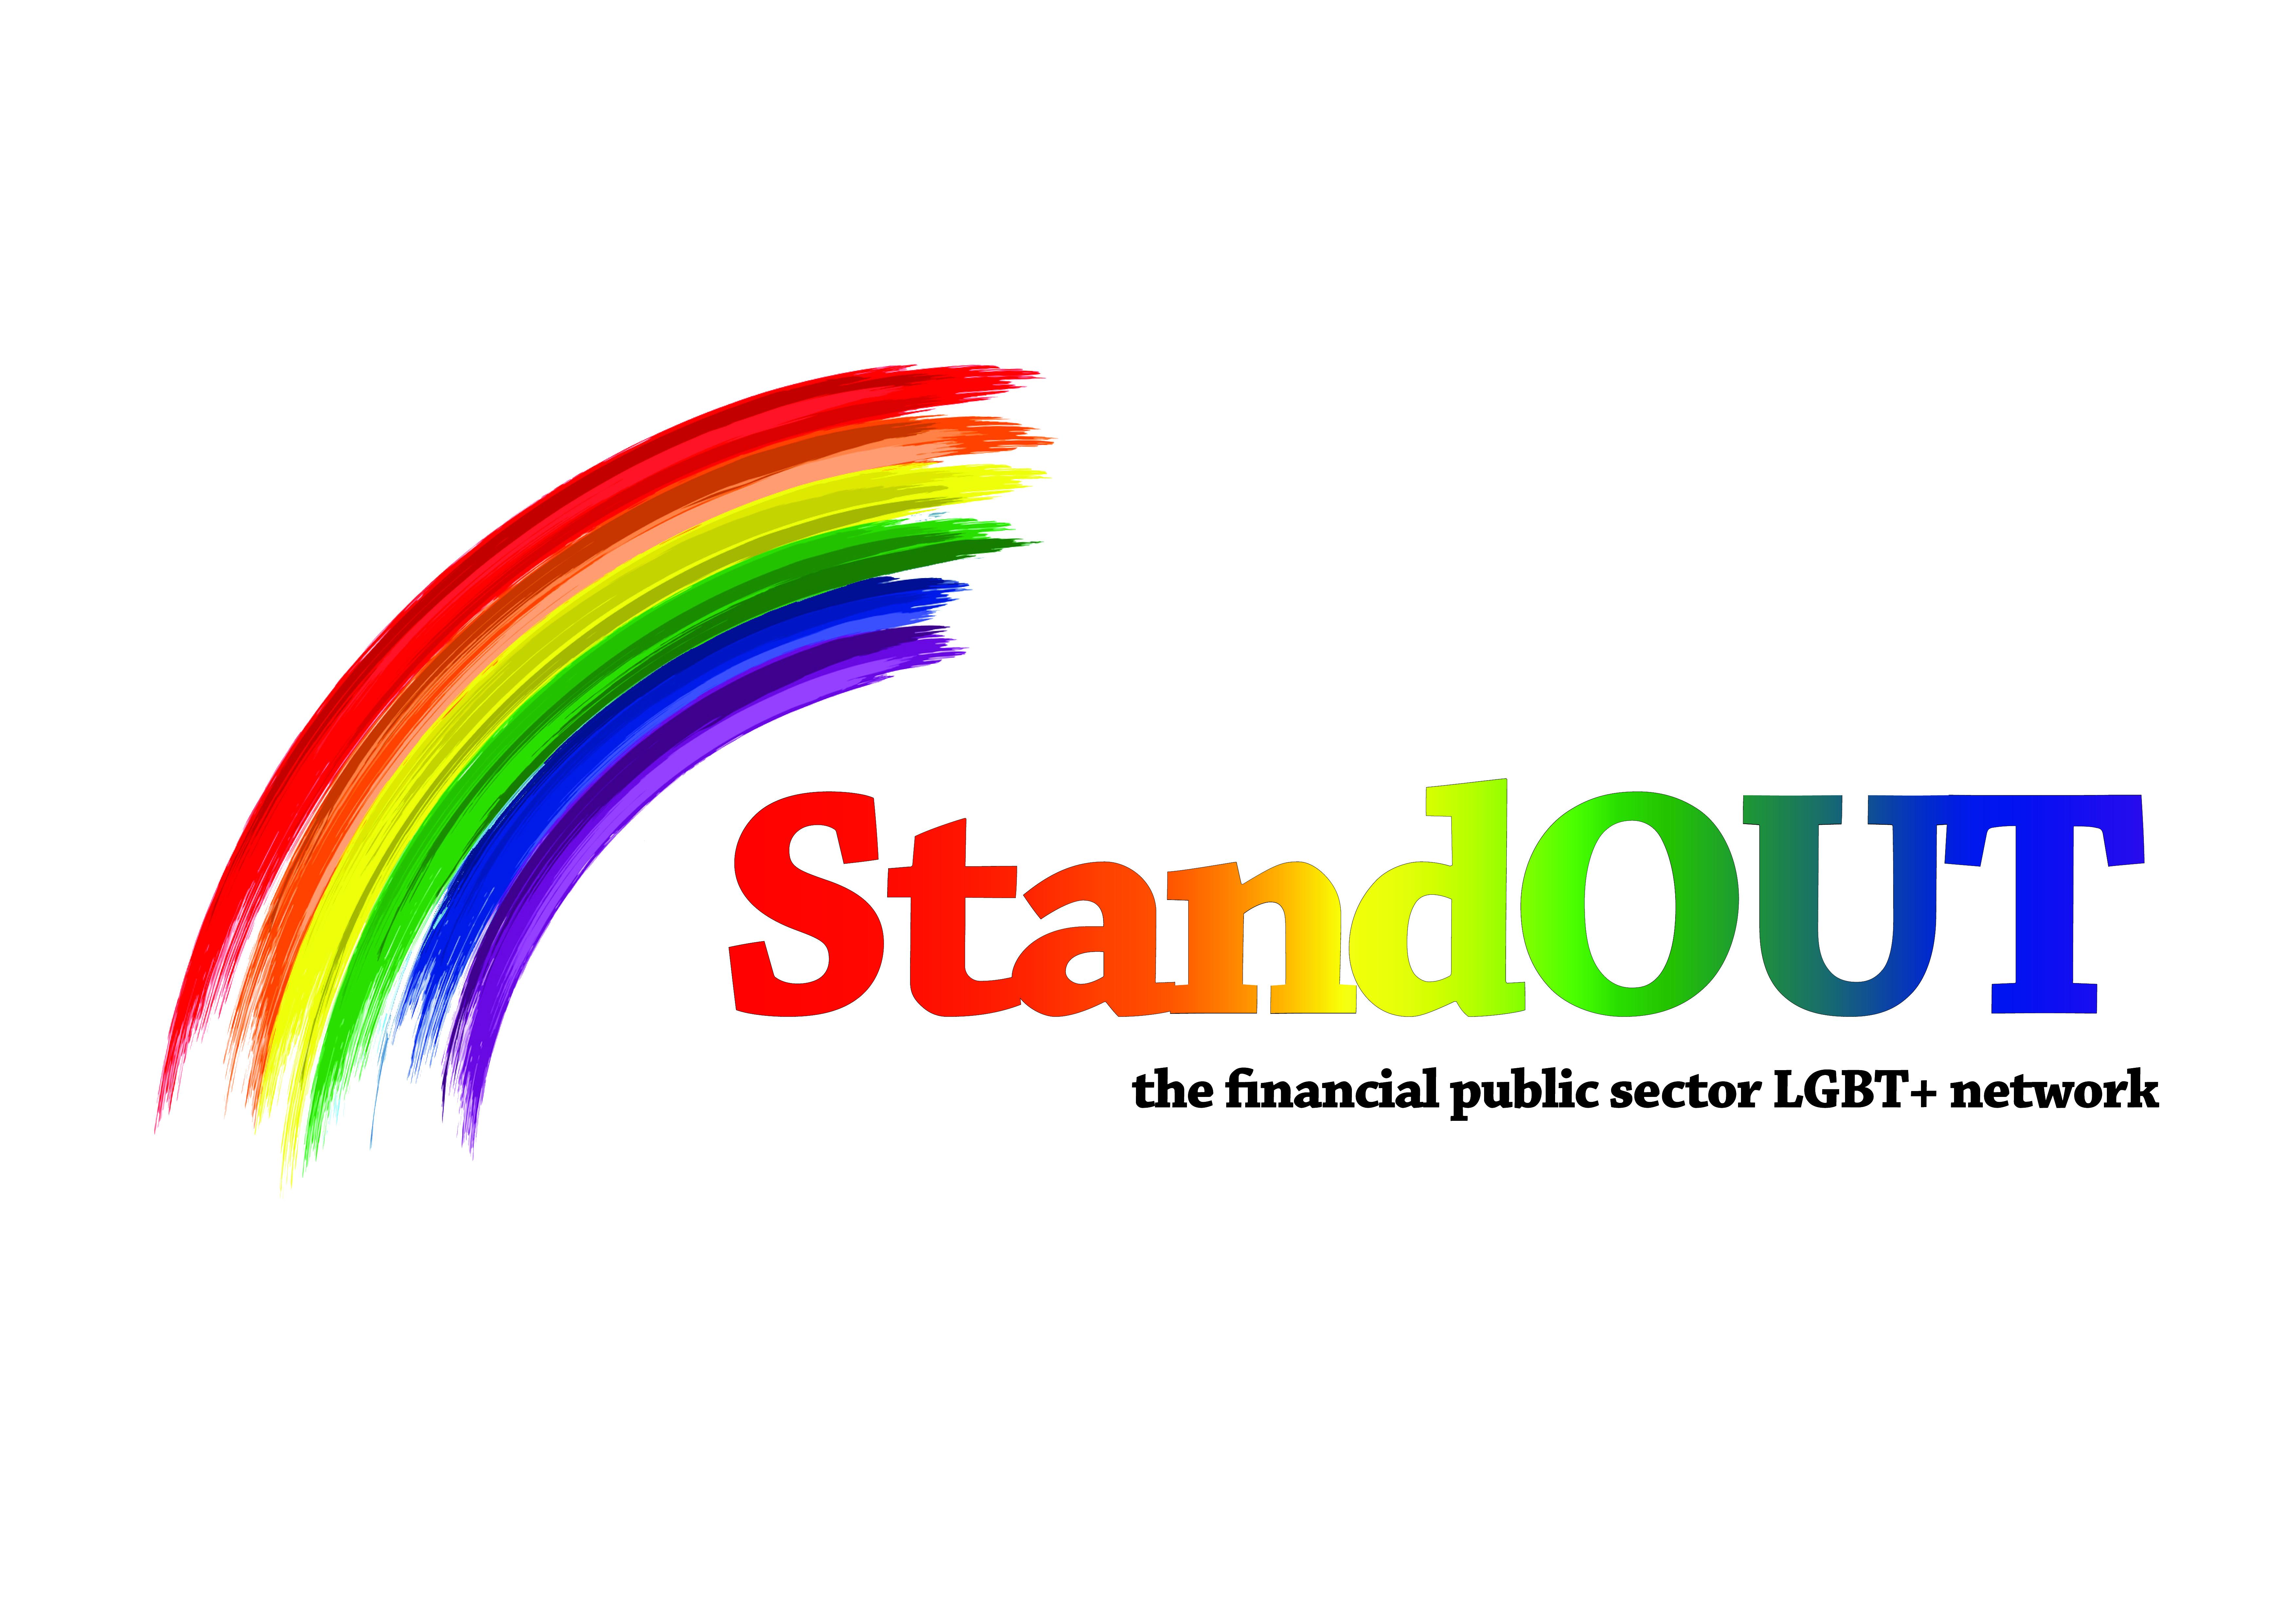 StandOUT logo